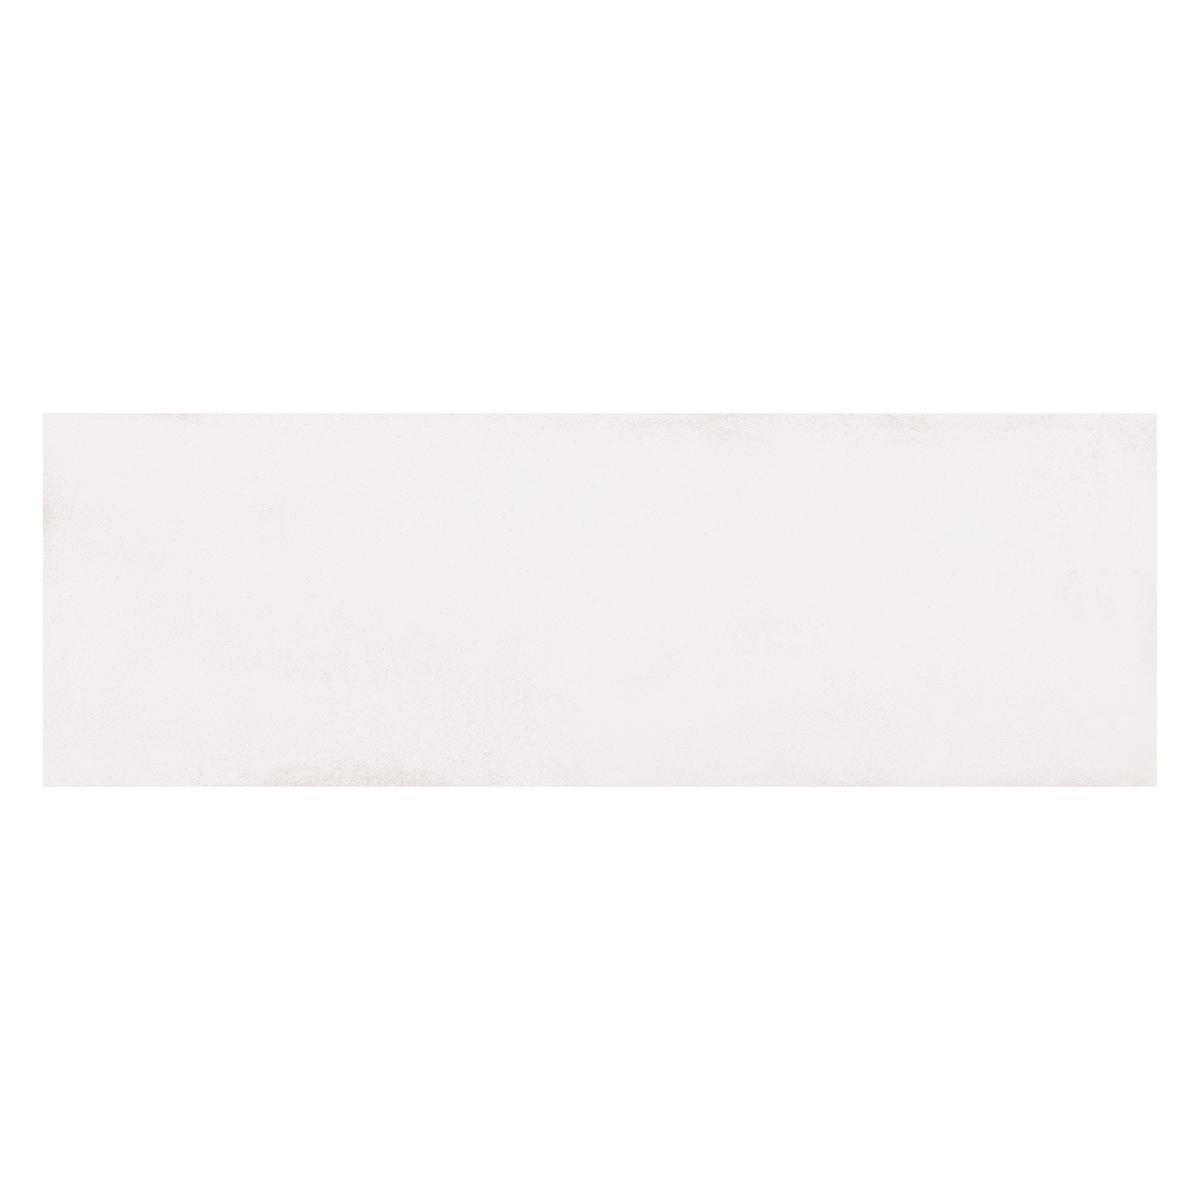 Mayólica Hit Marfil Mate - 20X60 cm - 1.08 m2